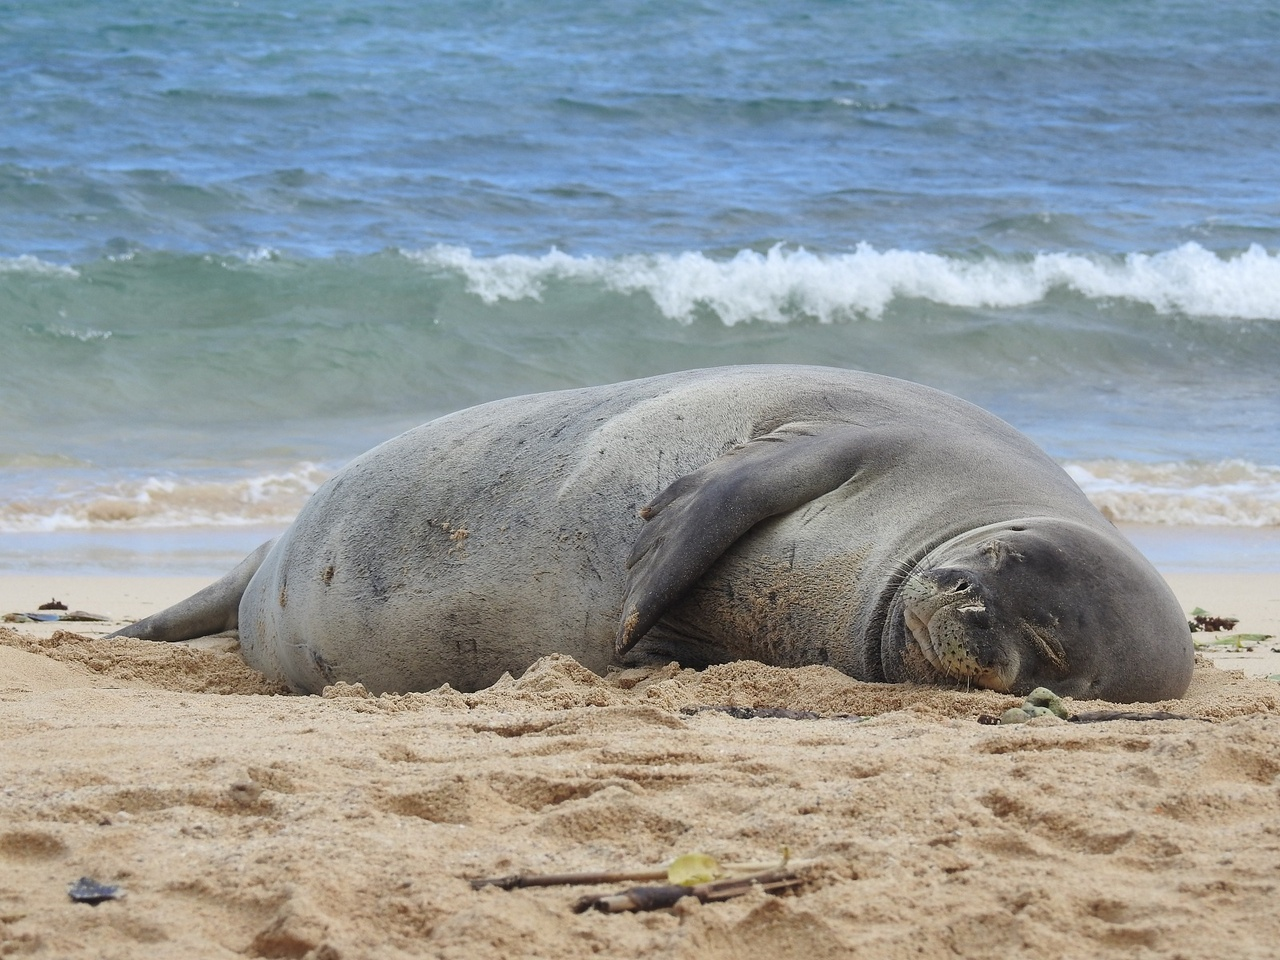 Monk seal lying on beach with ocean behind.